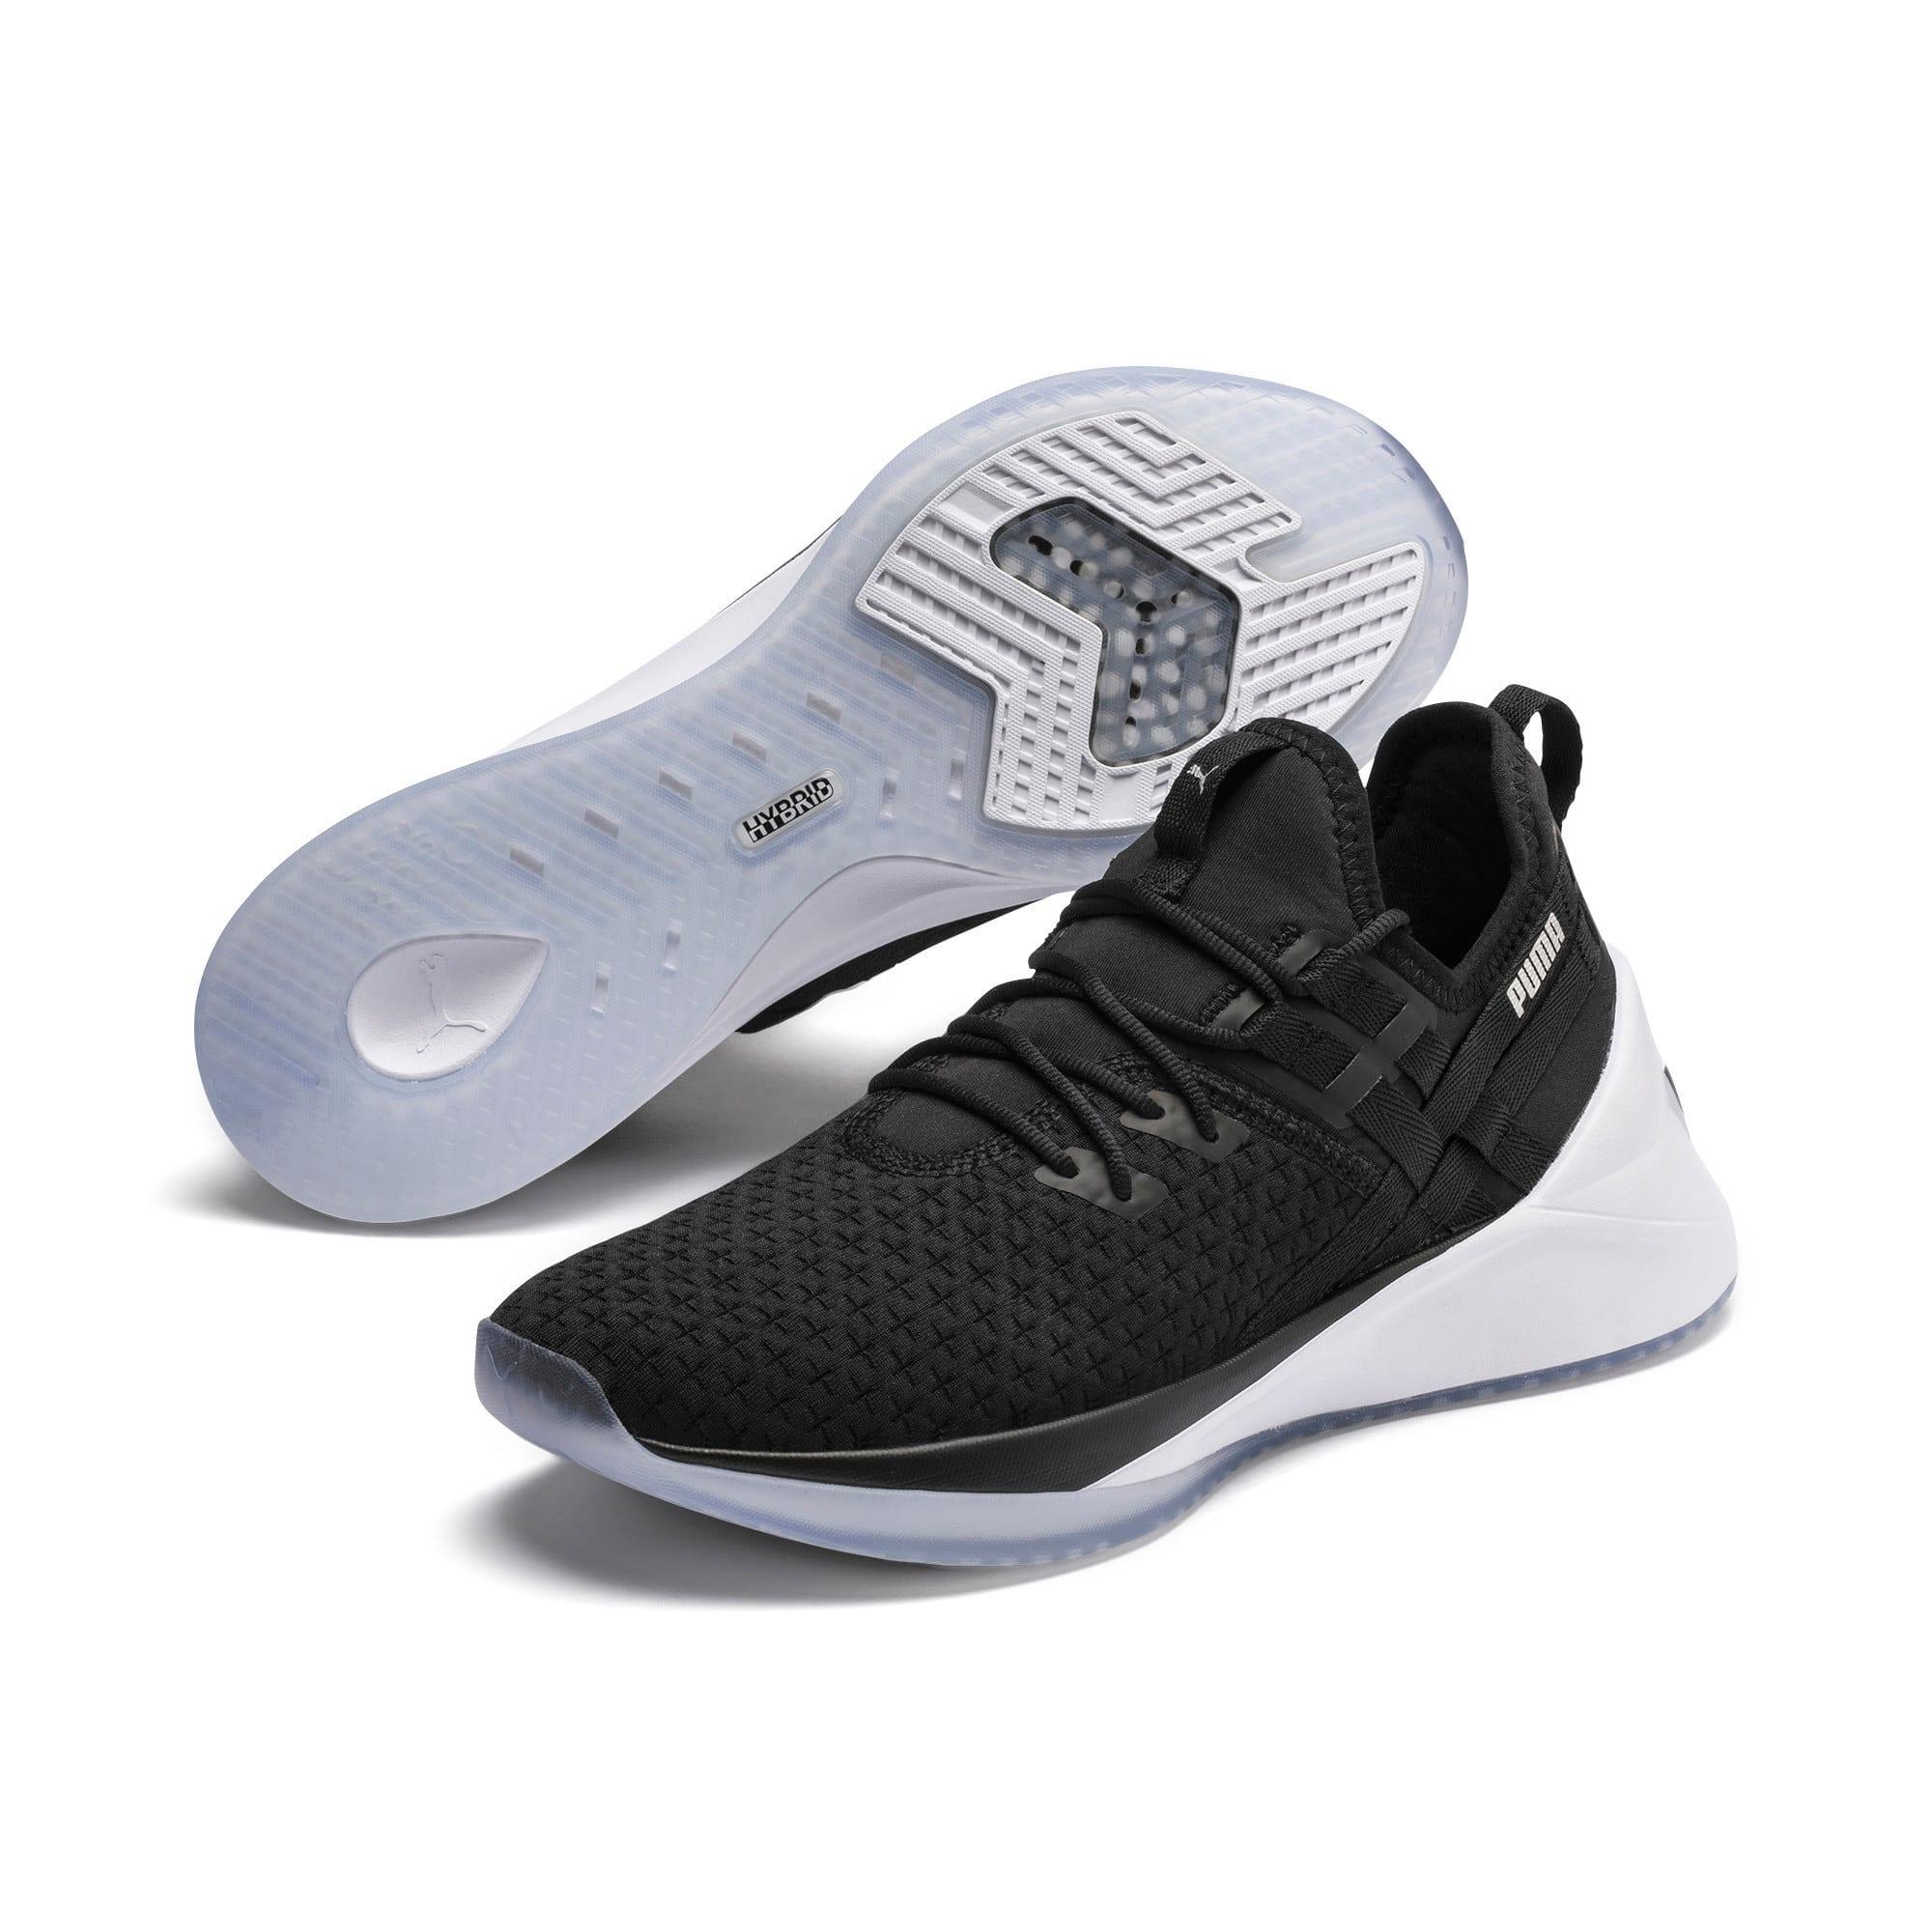 Thumbnail 2 of Jaab XT Women's Training Shoes, Puma Black-Puma White, medium